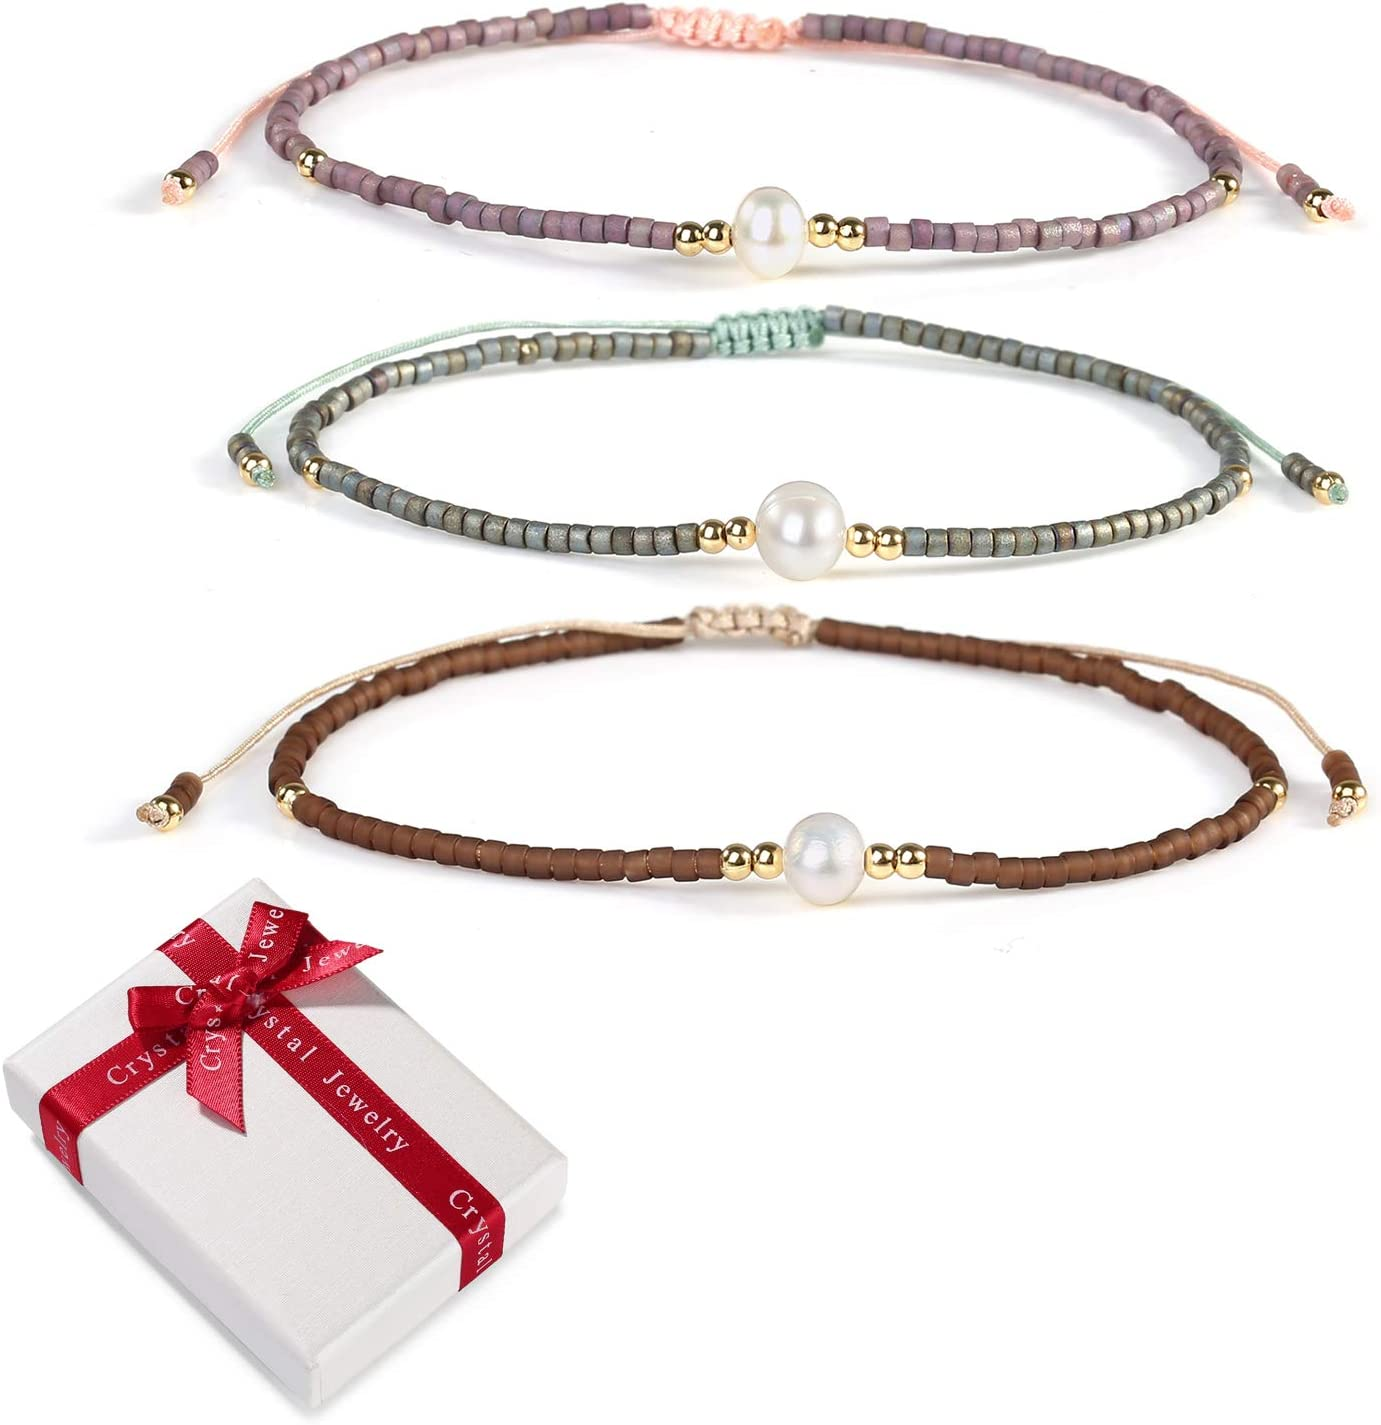 3 piezas mezcla de perlas de color Miyuki Beads Charm Bracelet Friendship Bracelets Set para mujeres Chica,Boho Elastic Ajustable Delicate Ladies Bangle Gift para mamá Mejor amiga Navidad Cumpleaños